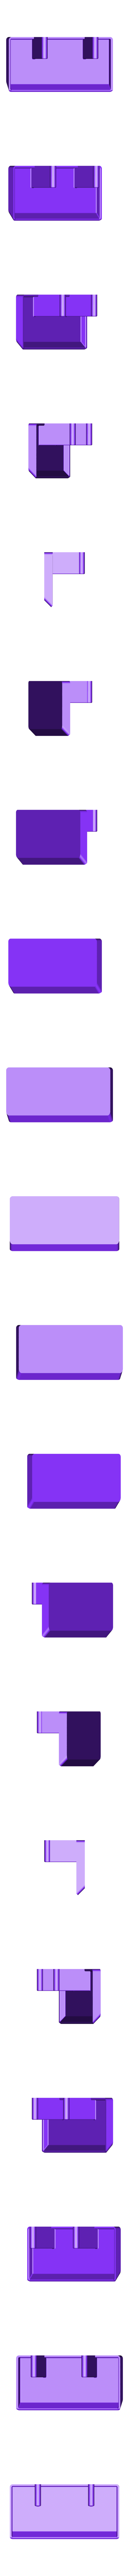 Wall_Organizer_Double_Stripes_-_Tray.stl Download free STL file Wall Organizer • 3D printing object, 3DBROOKLYN